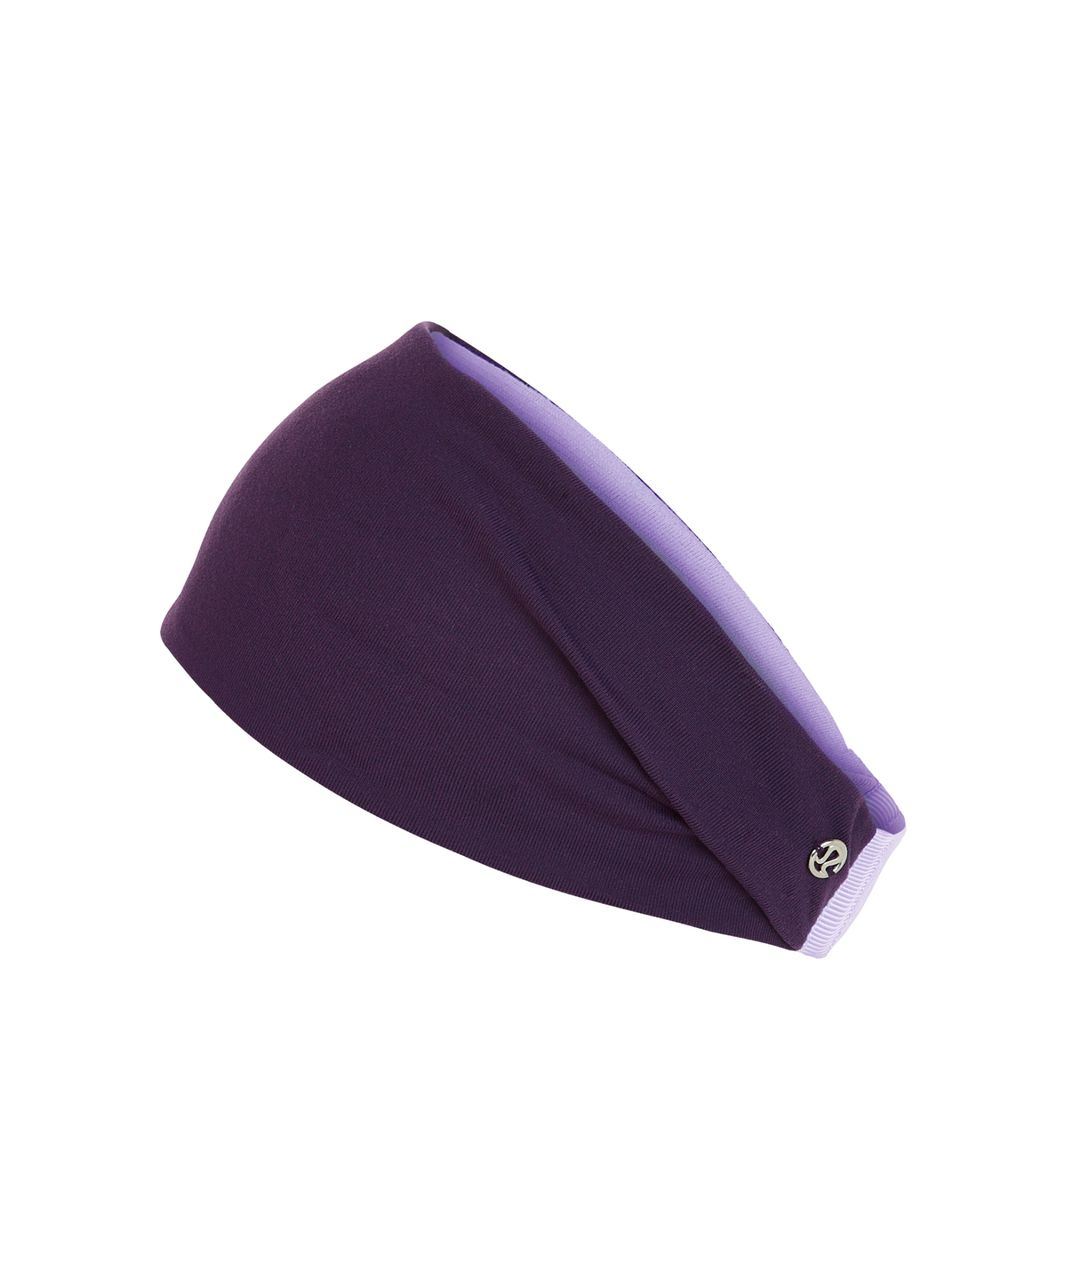 Lululemon Fringe Fighter Headband - Deep Zinfandel / Lilac